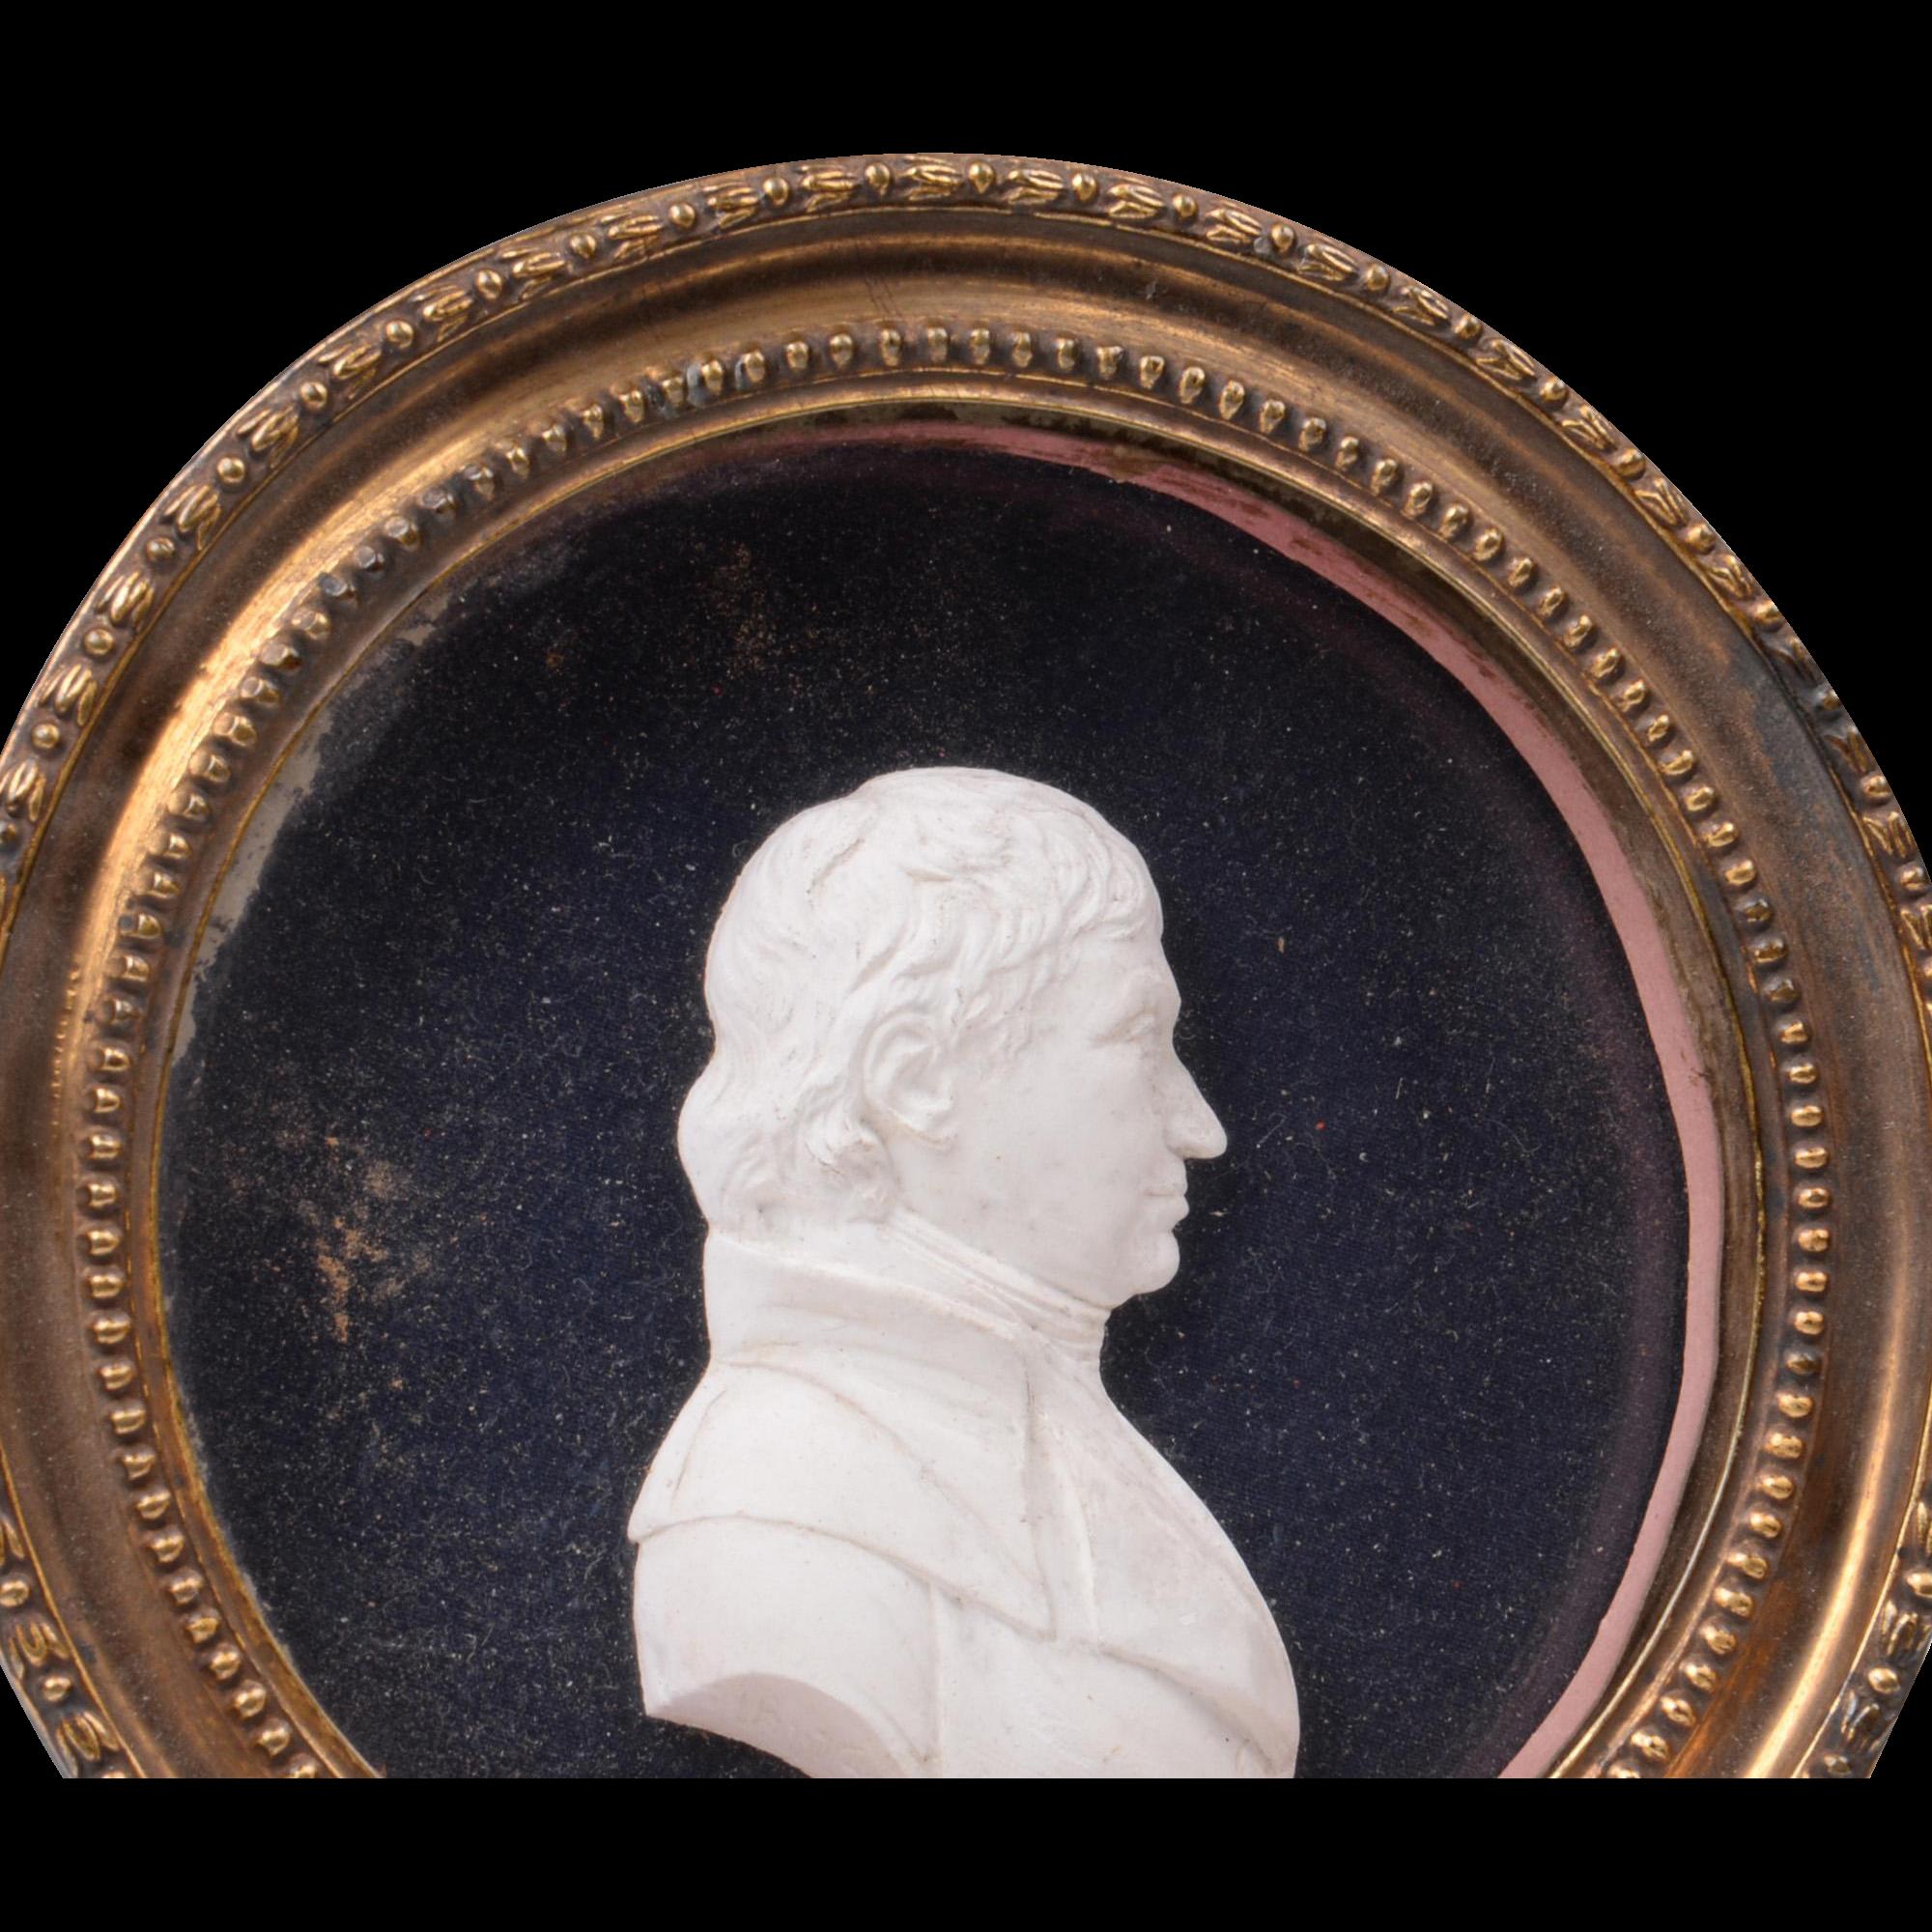 Early 19th C. Paste Portrait Medallion of Gentleman Framed Under Glass